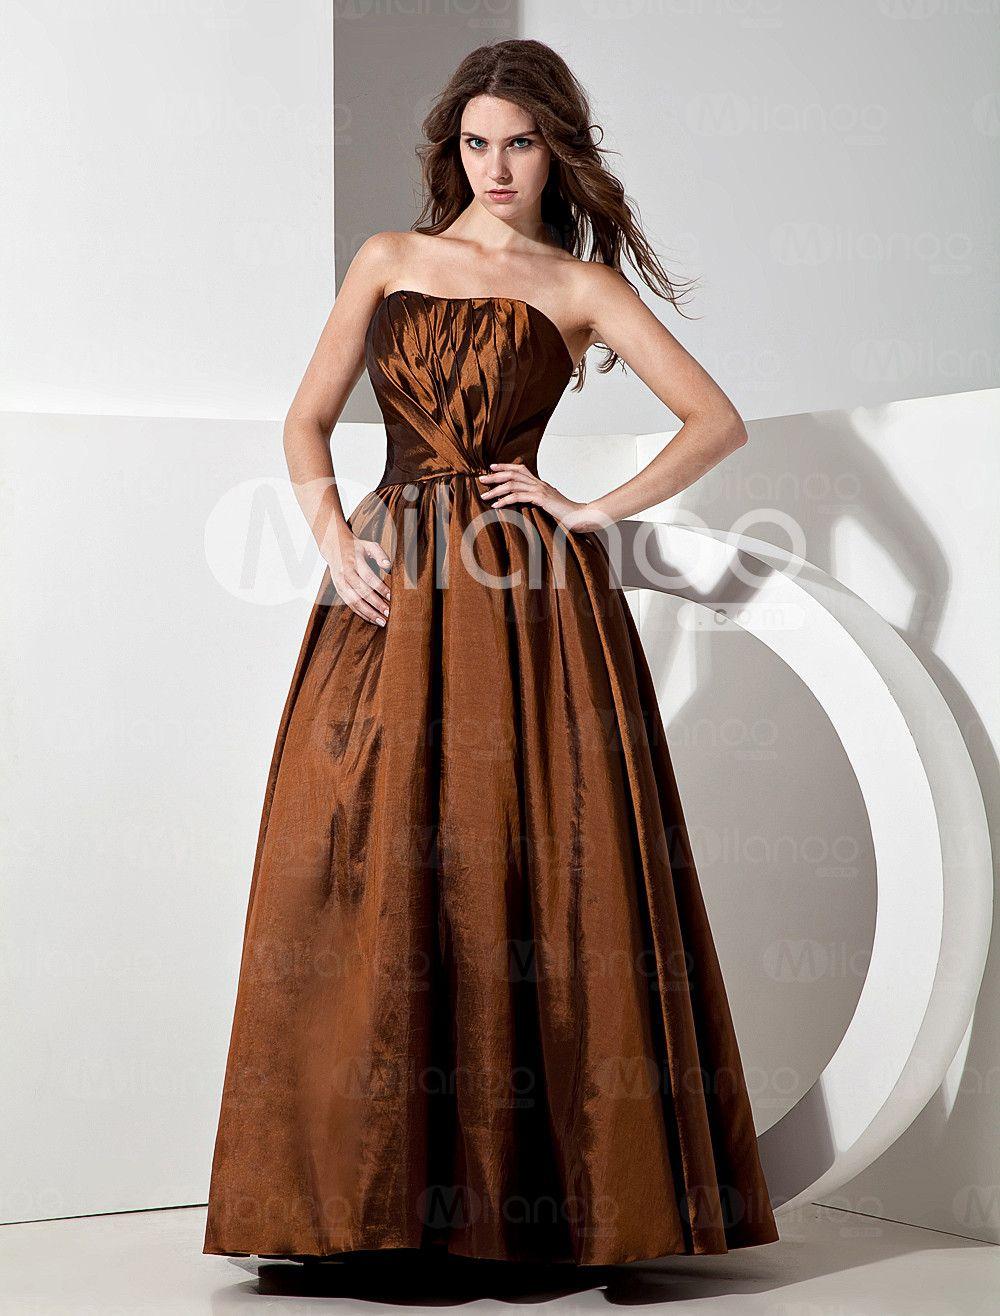 Vintage Chocolate Satin Strapless Floor Length Bridesmaid Dress - Milanoo.com